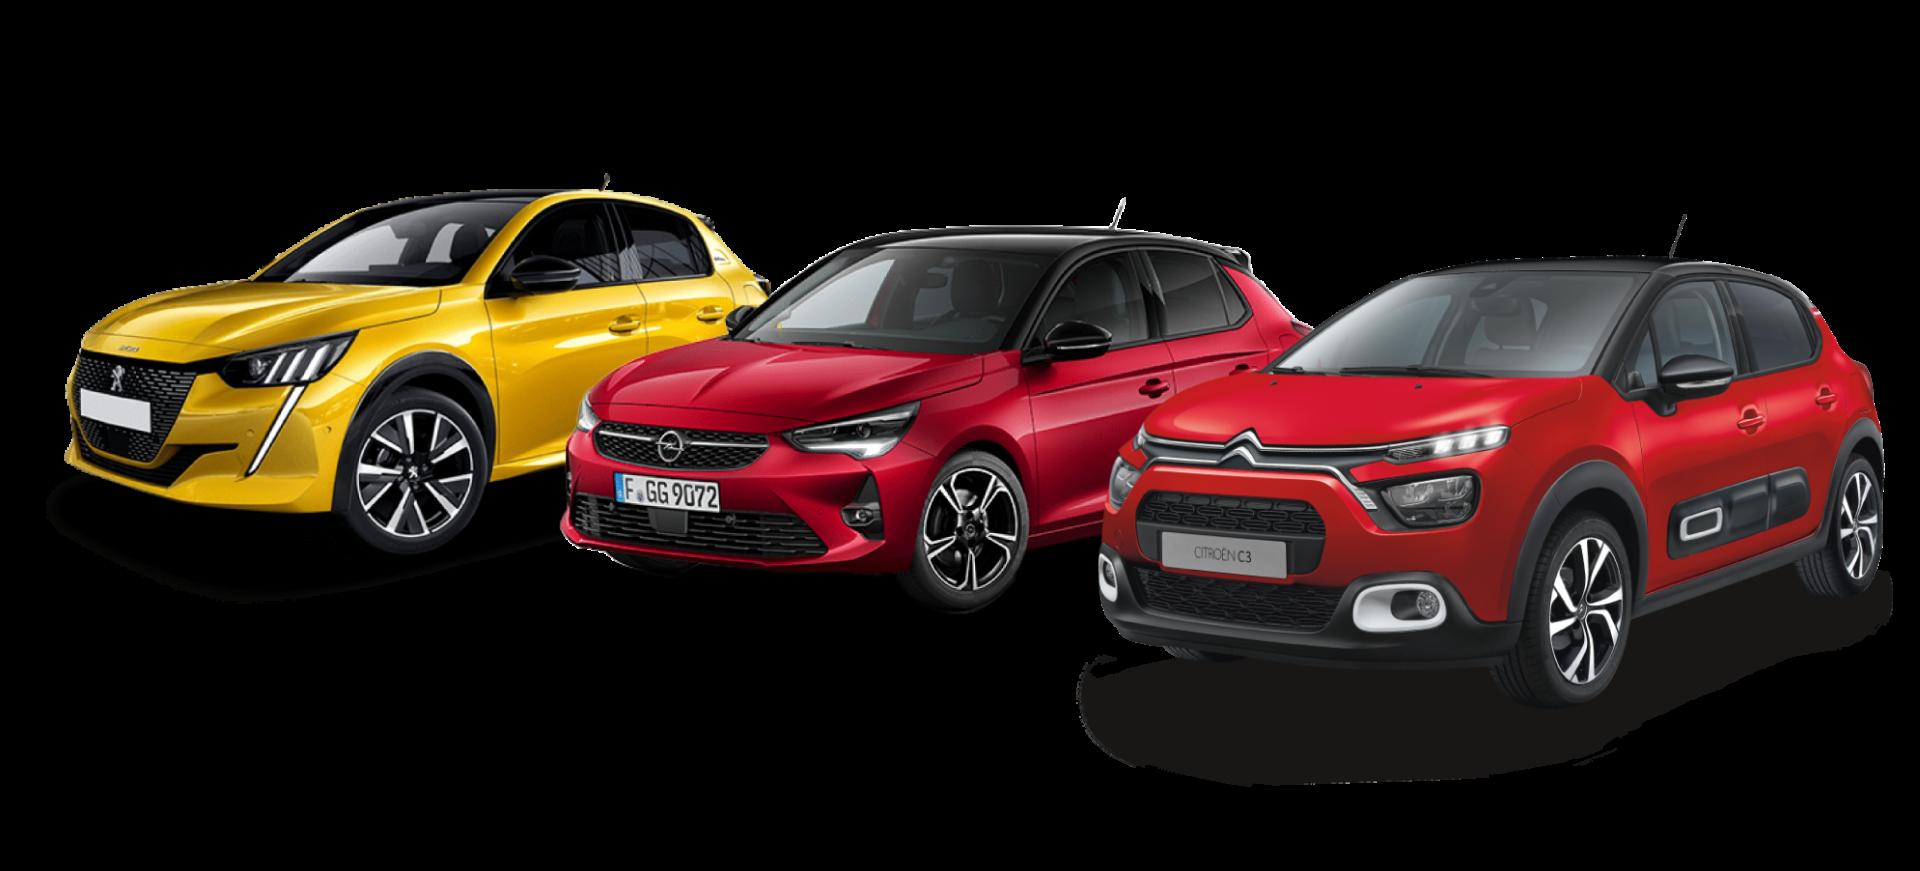 Macchine_Citroen_Peugoet_Opel